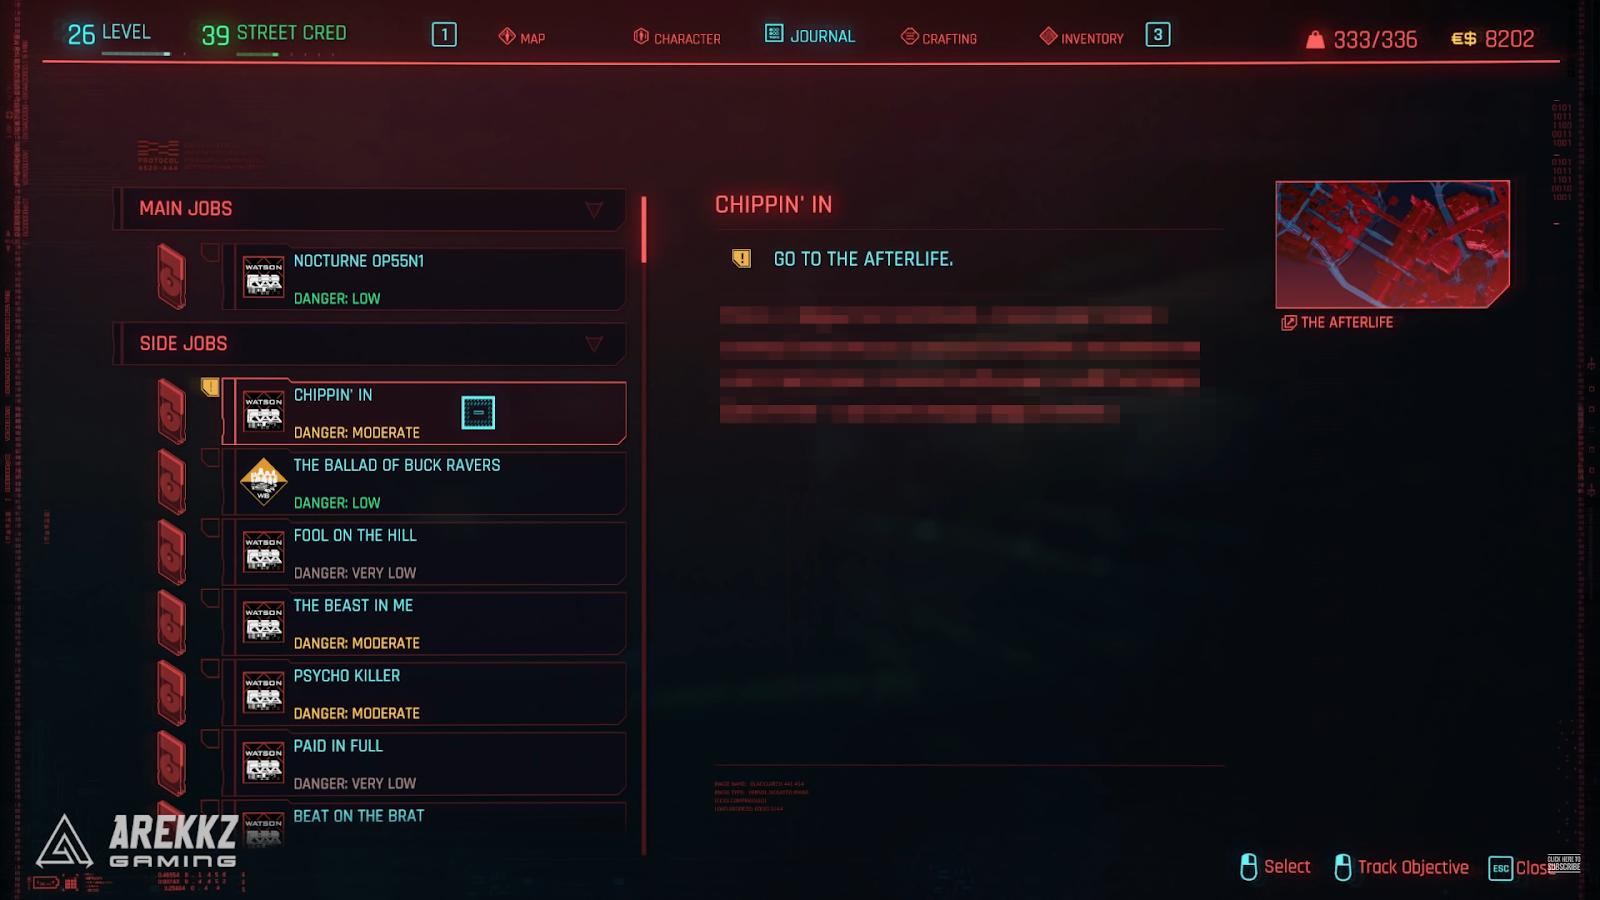 cyberpunk 2077 chippin in side mission job